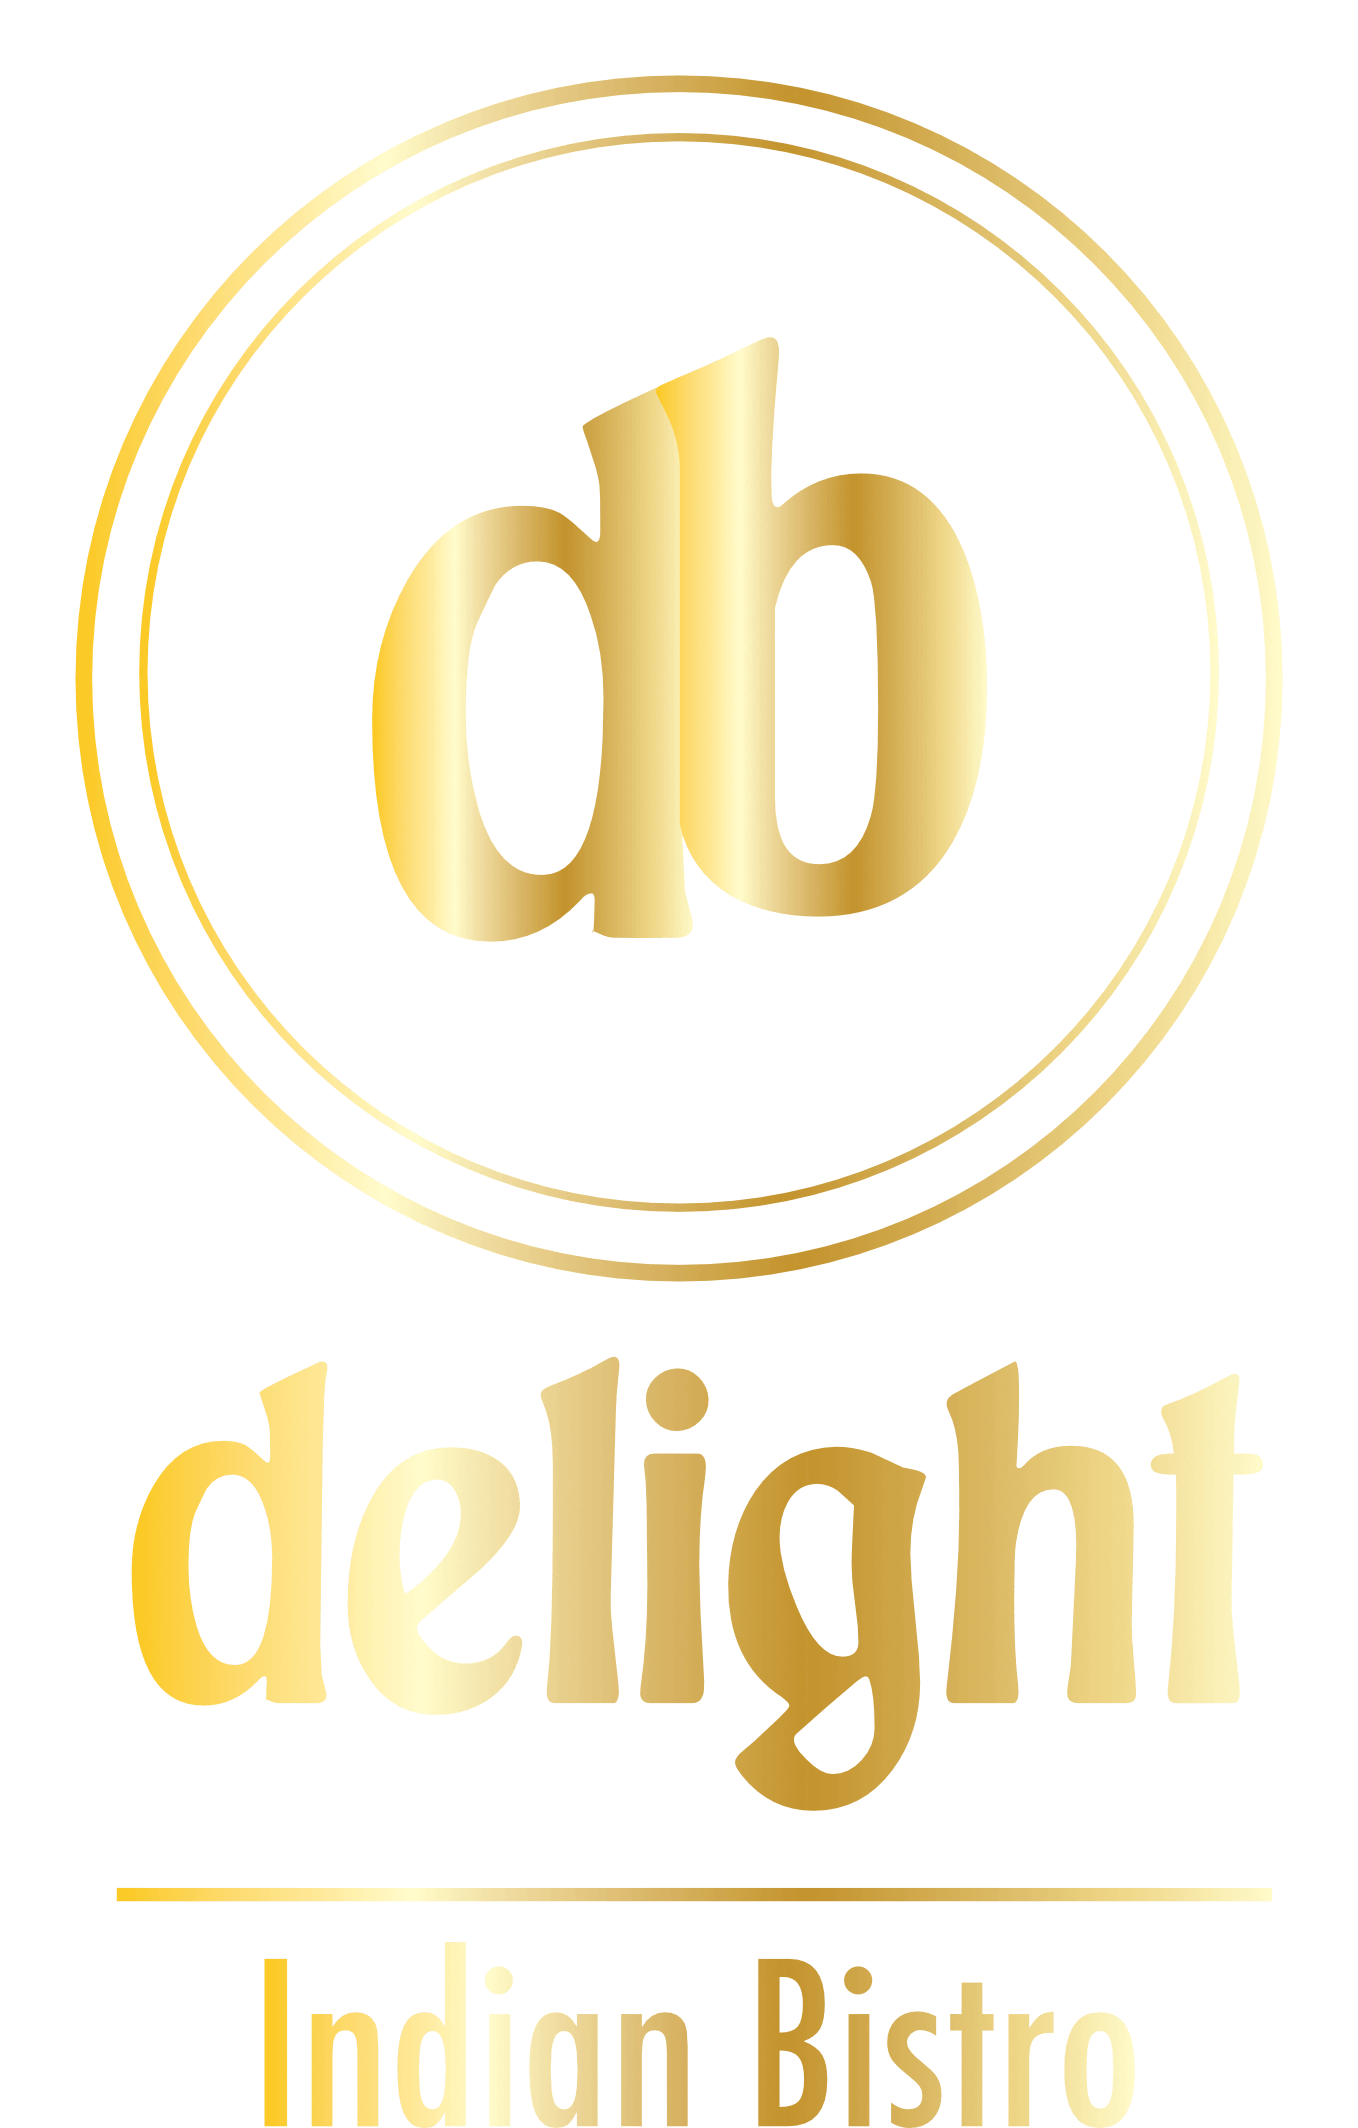 Delight Indian Bistro